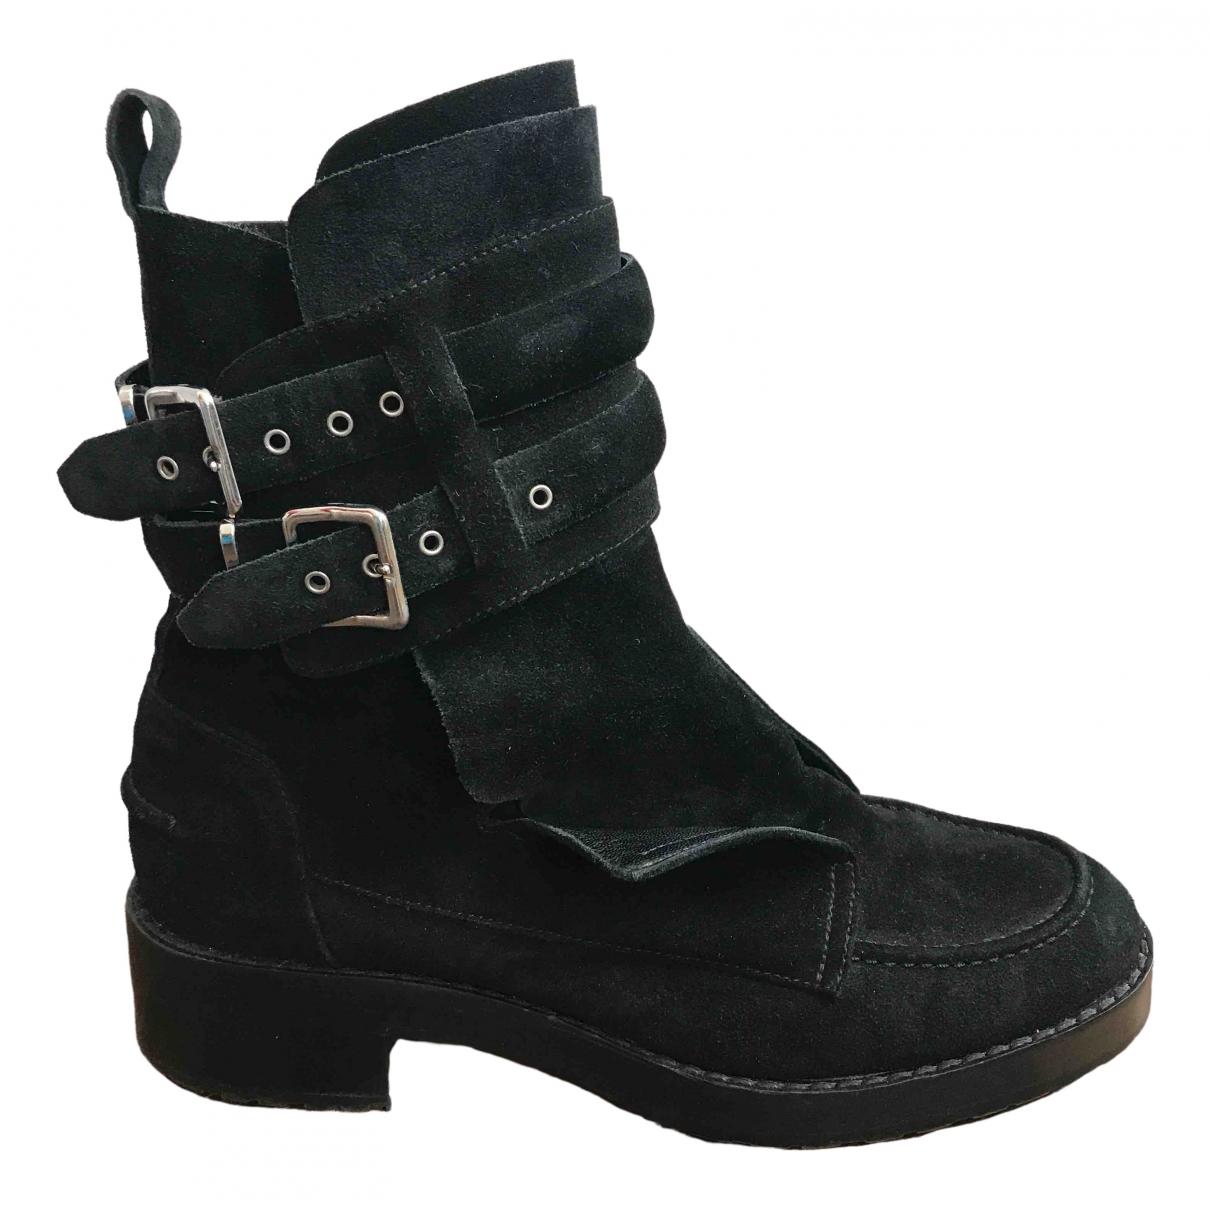 Balenciaga - Boots   pour femme en suede - noir